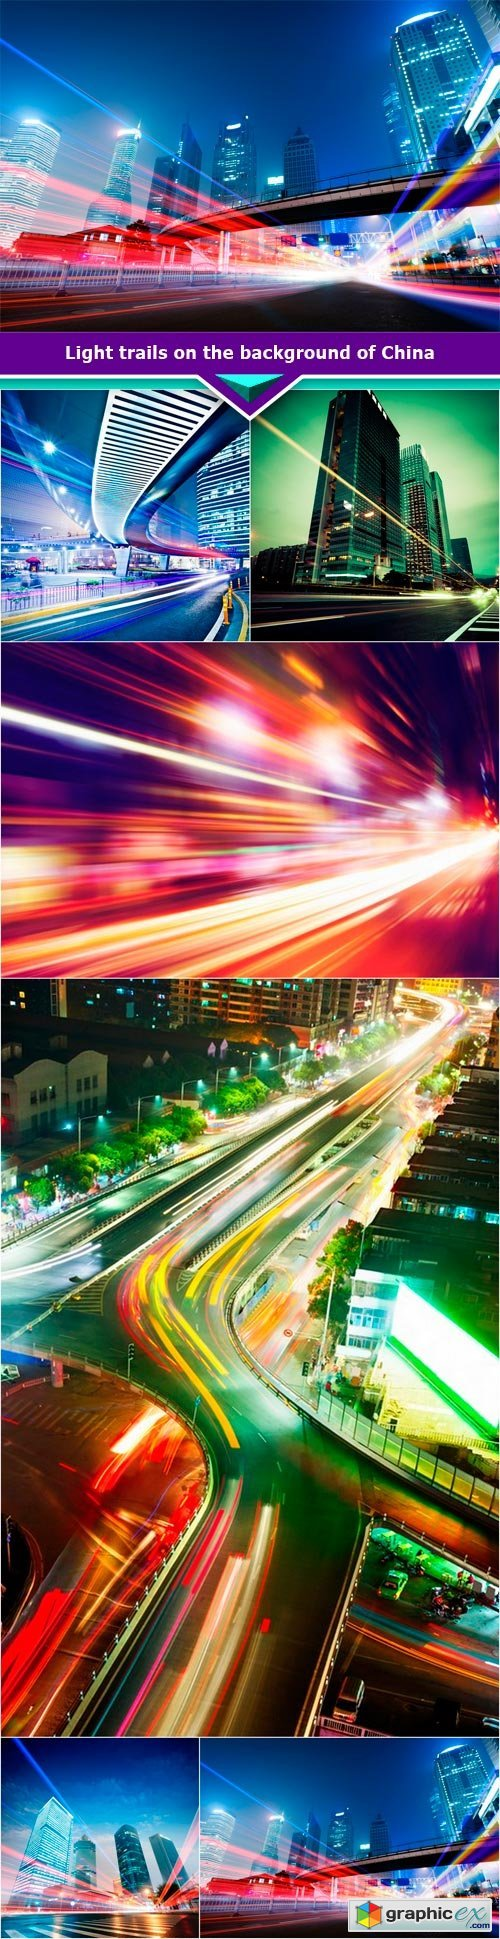 Light trails on the background of China 6x JPEG